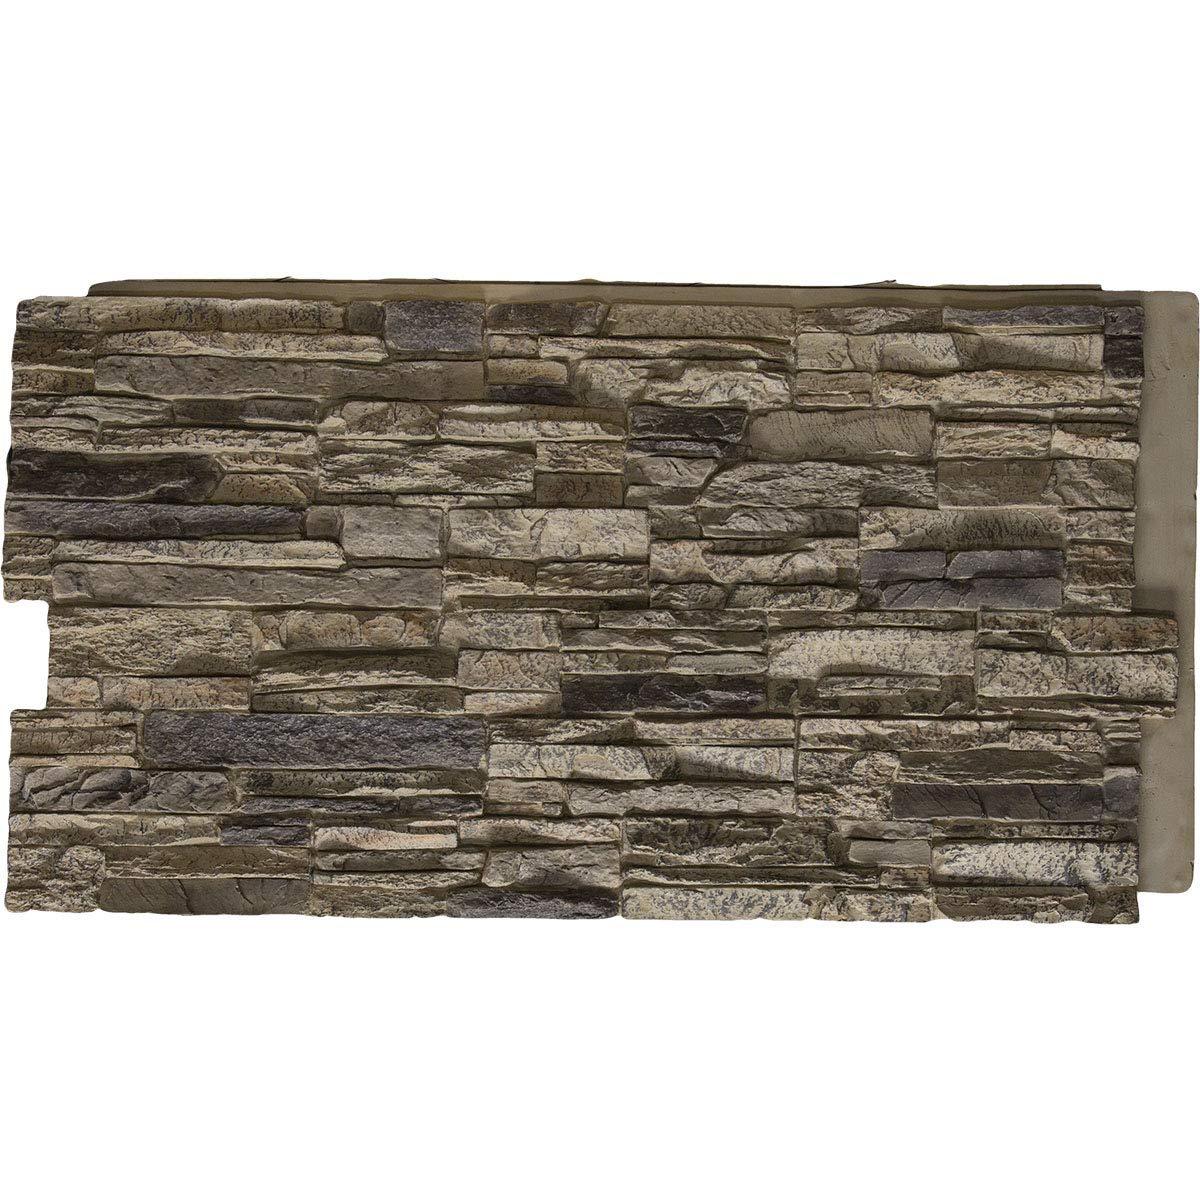 Ekena Millwork PNU24X48CNSR Canyon Ridge Stacked Stone Stonewall Faux Stone Siding Panel 48''W x 24''H x 1 1/4''D Smokey Ridge 1 EA by Ekena Millwork